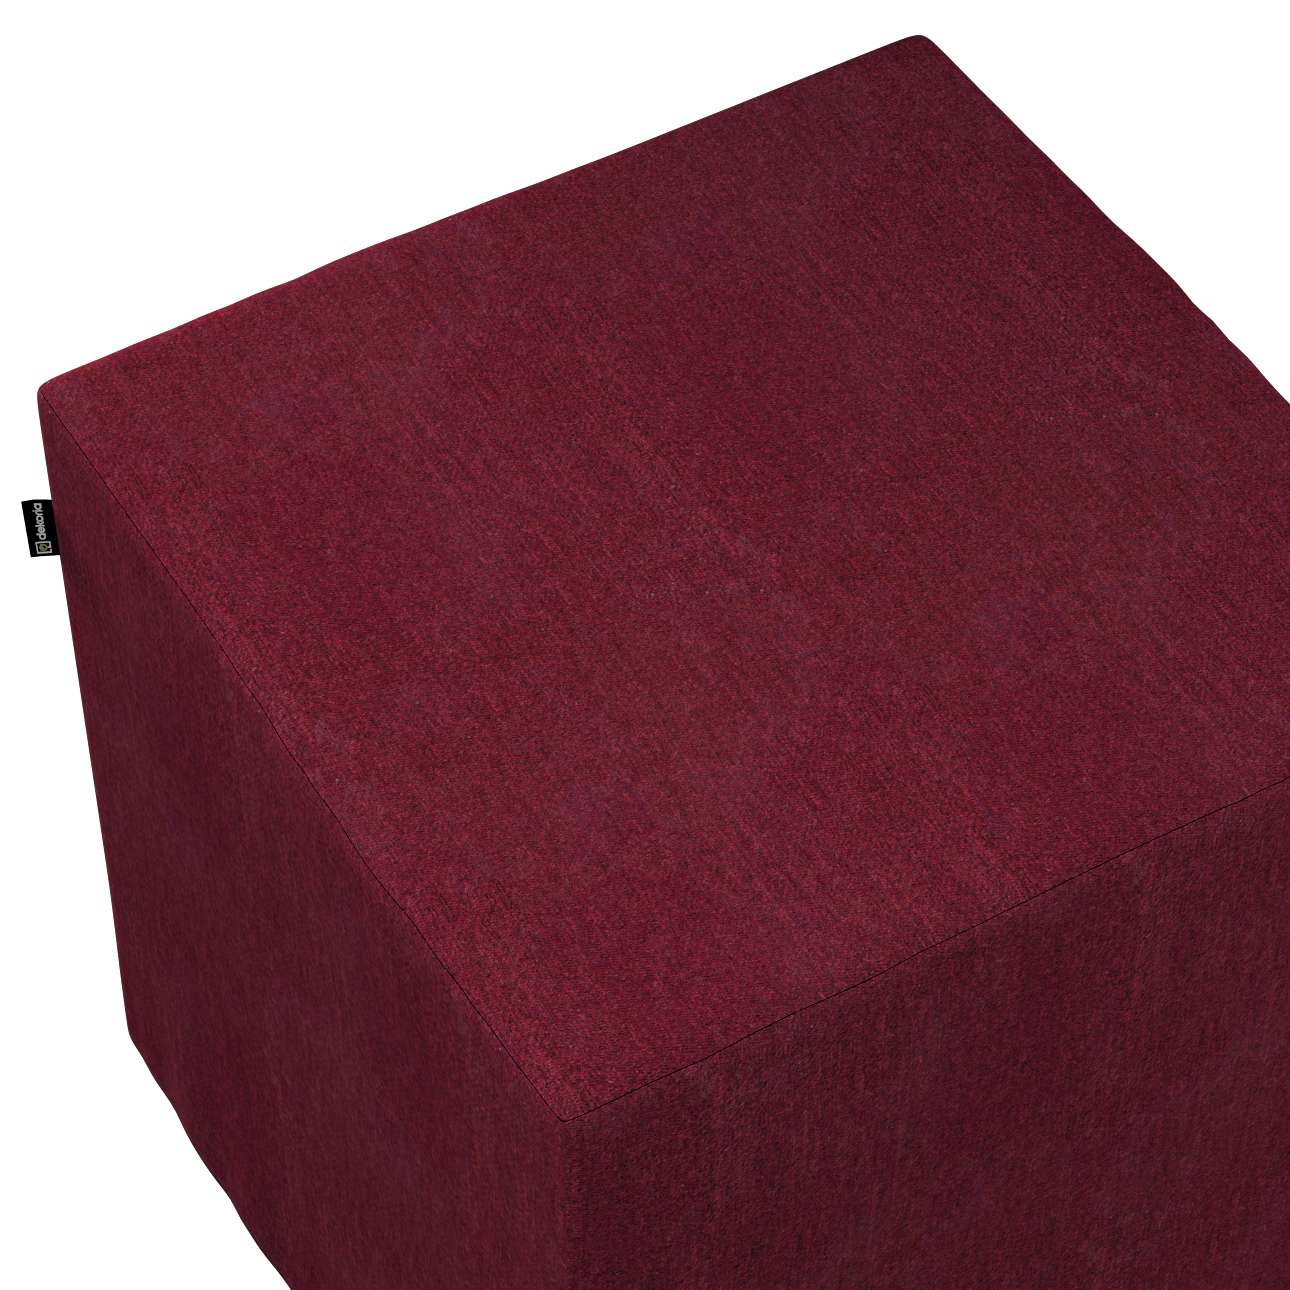 Pufa kostka w kolekcji Chenille, tkanina: 702-19